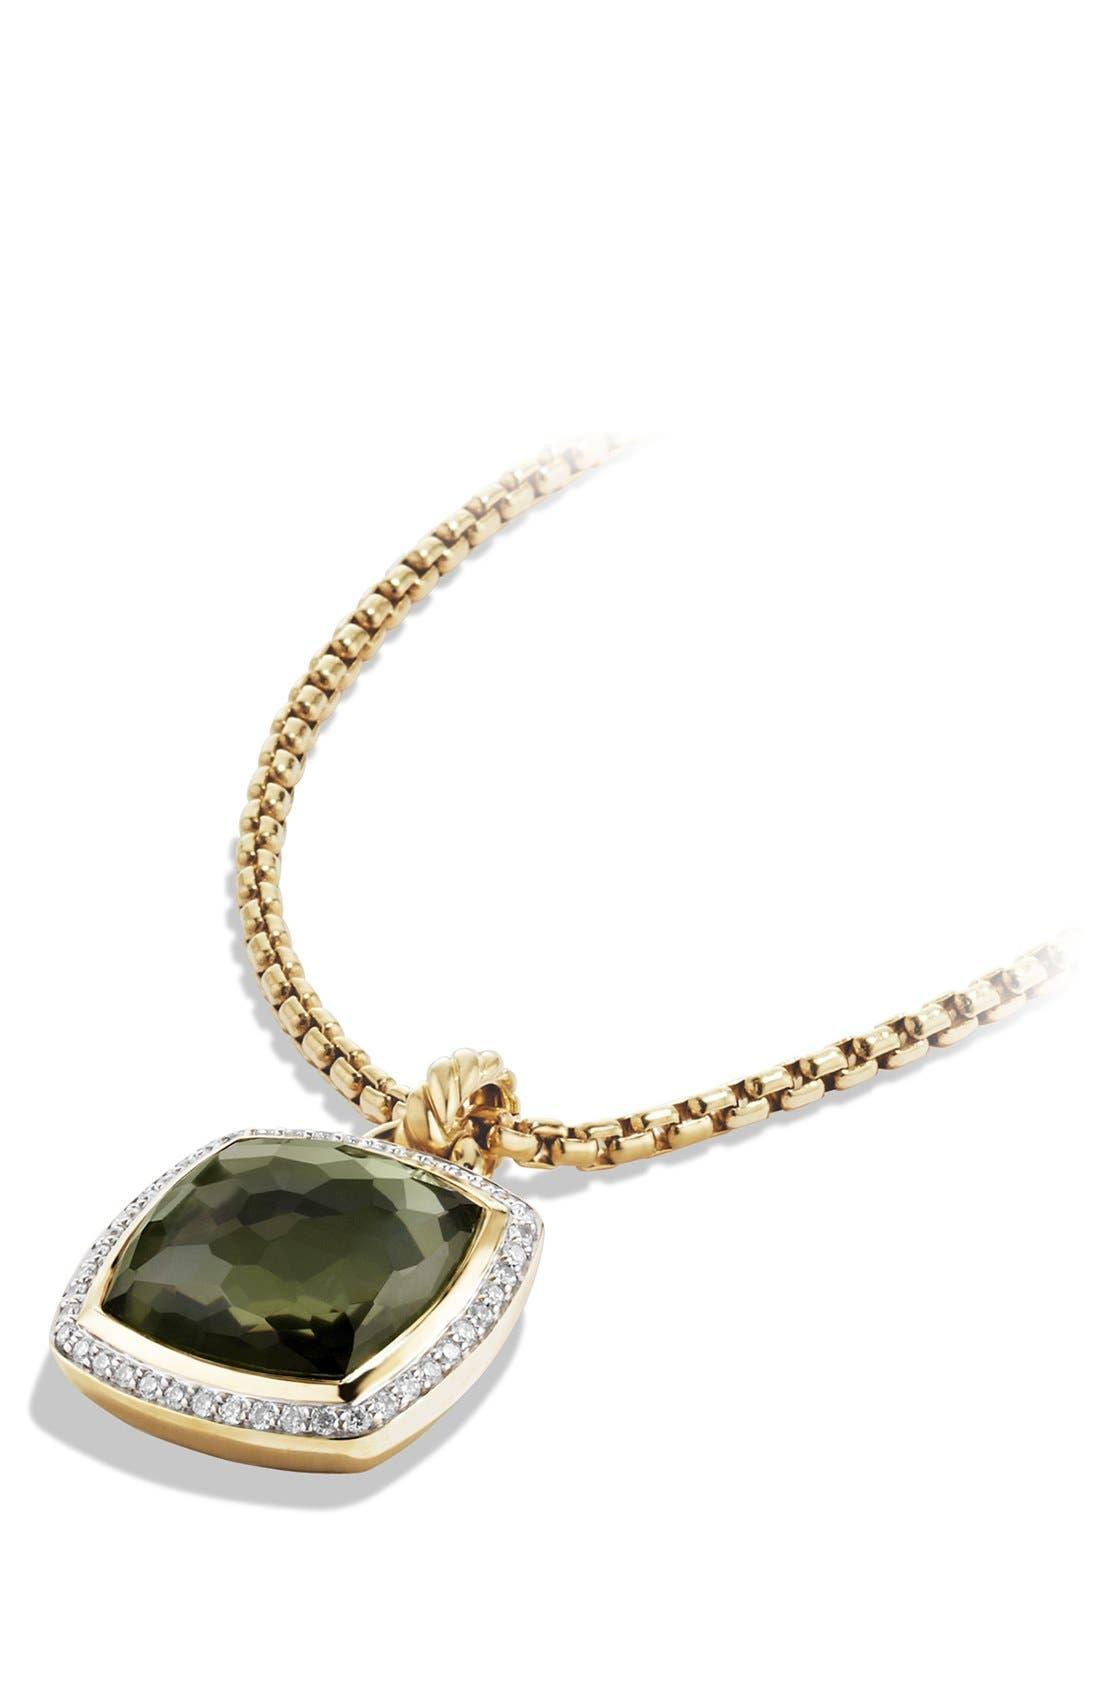 Alternate Image 3  - David Yurman 'Albion' Pendant with Lemon Citrine and Diamonds in Gold